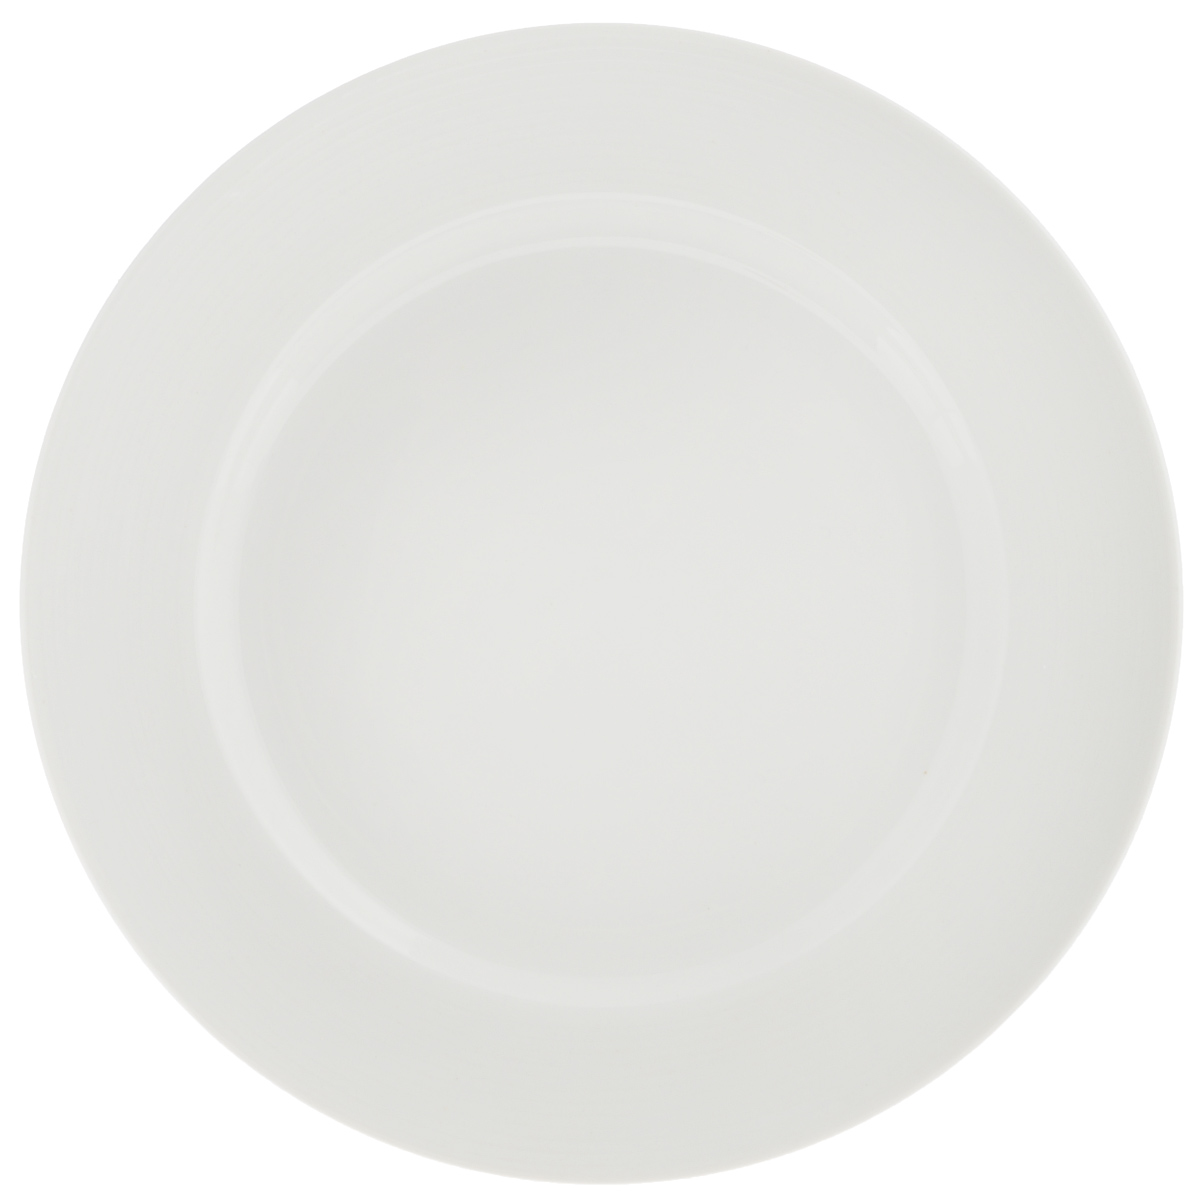 "Тарелка десертная Tescoma ""Opus Stripes"", диаметр 20 см"